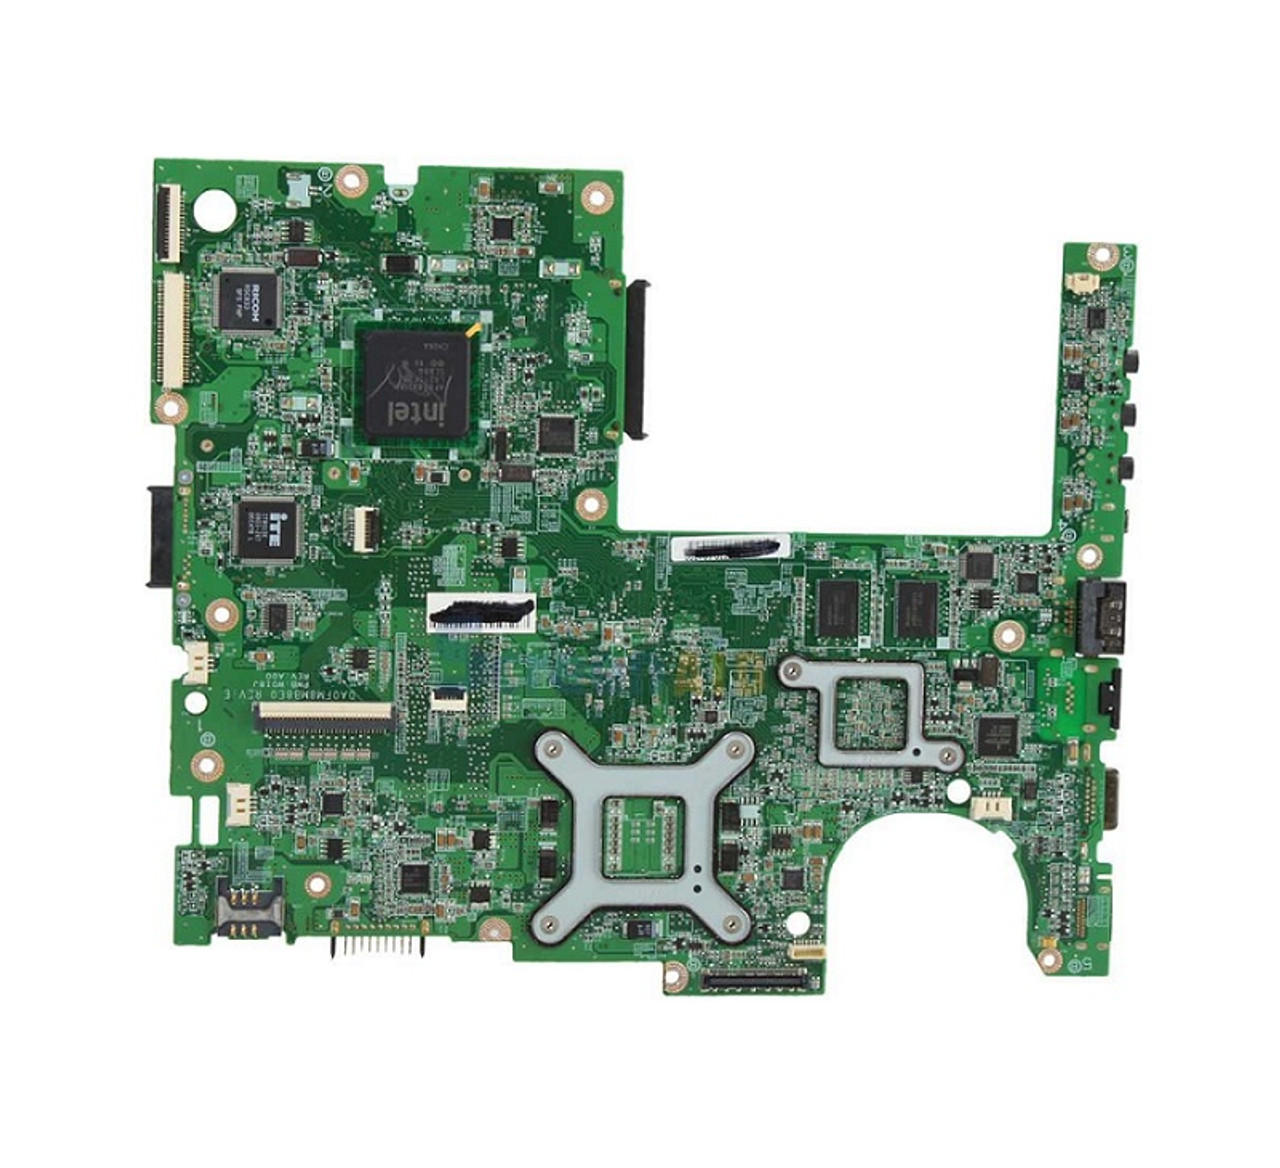 V000175220 Toshiba L510 Intel Laptop Motherboard s989